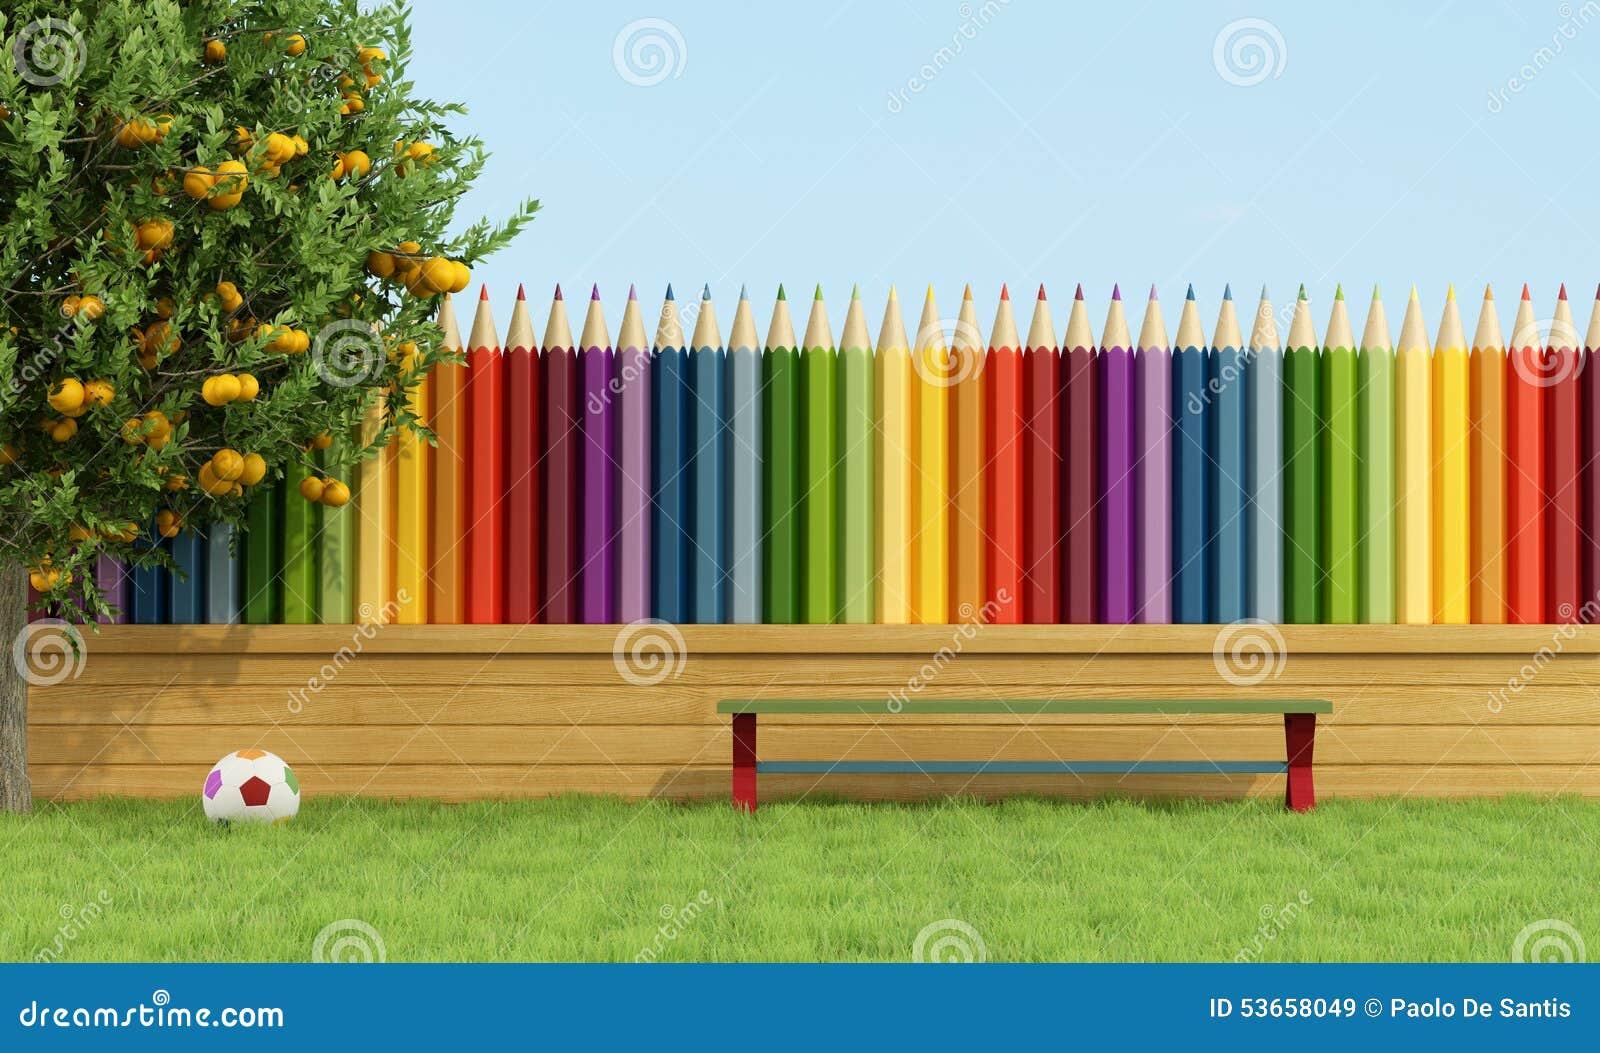 bunter garten f r kinder stock abbildung bild 53658049. Black Bedroom Furniture Sets. Home Design Ideas